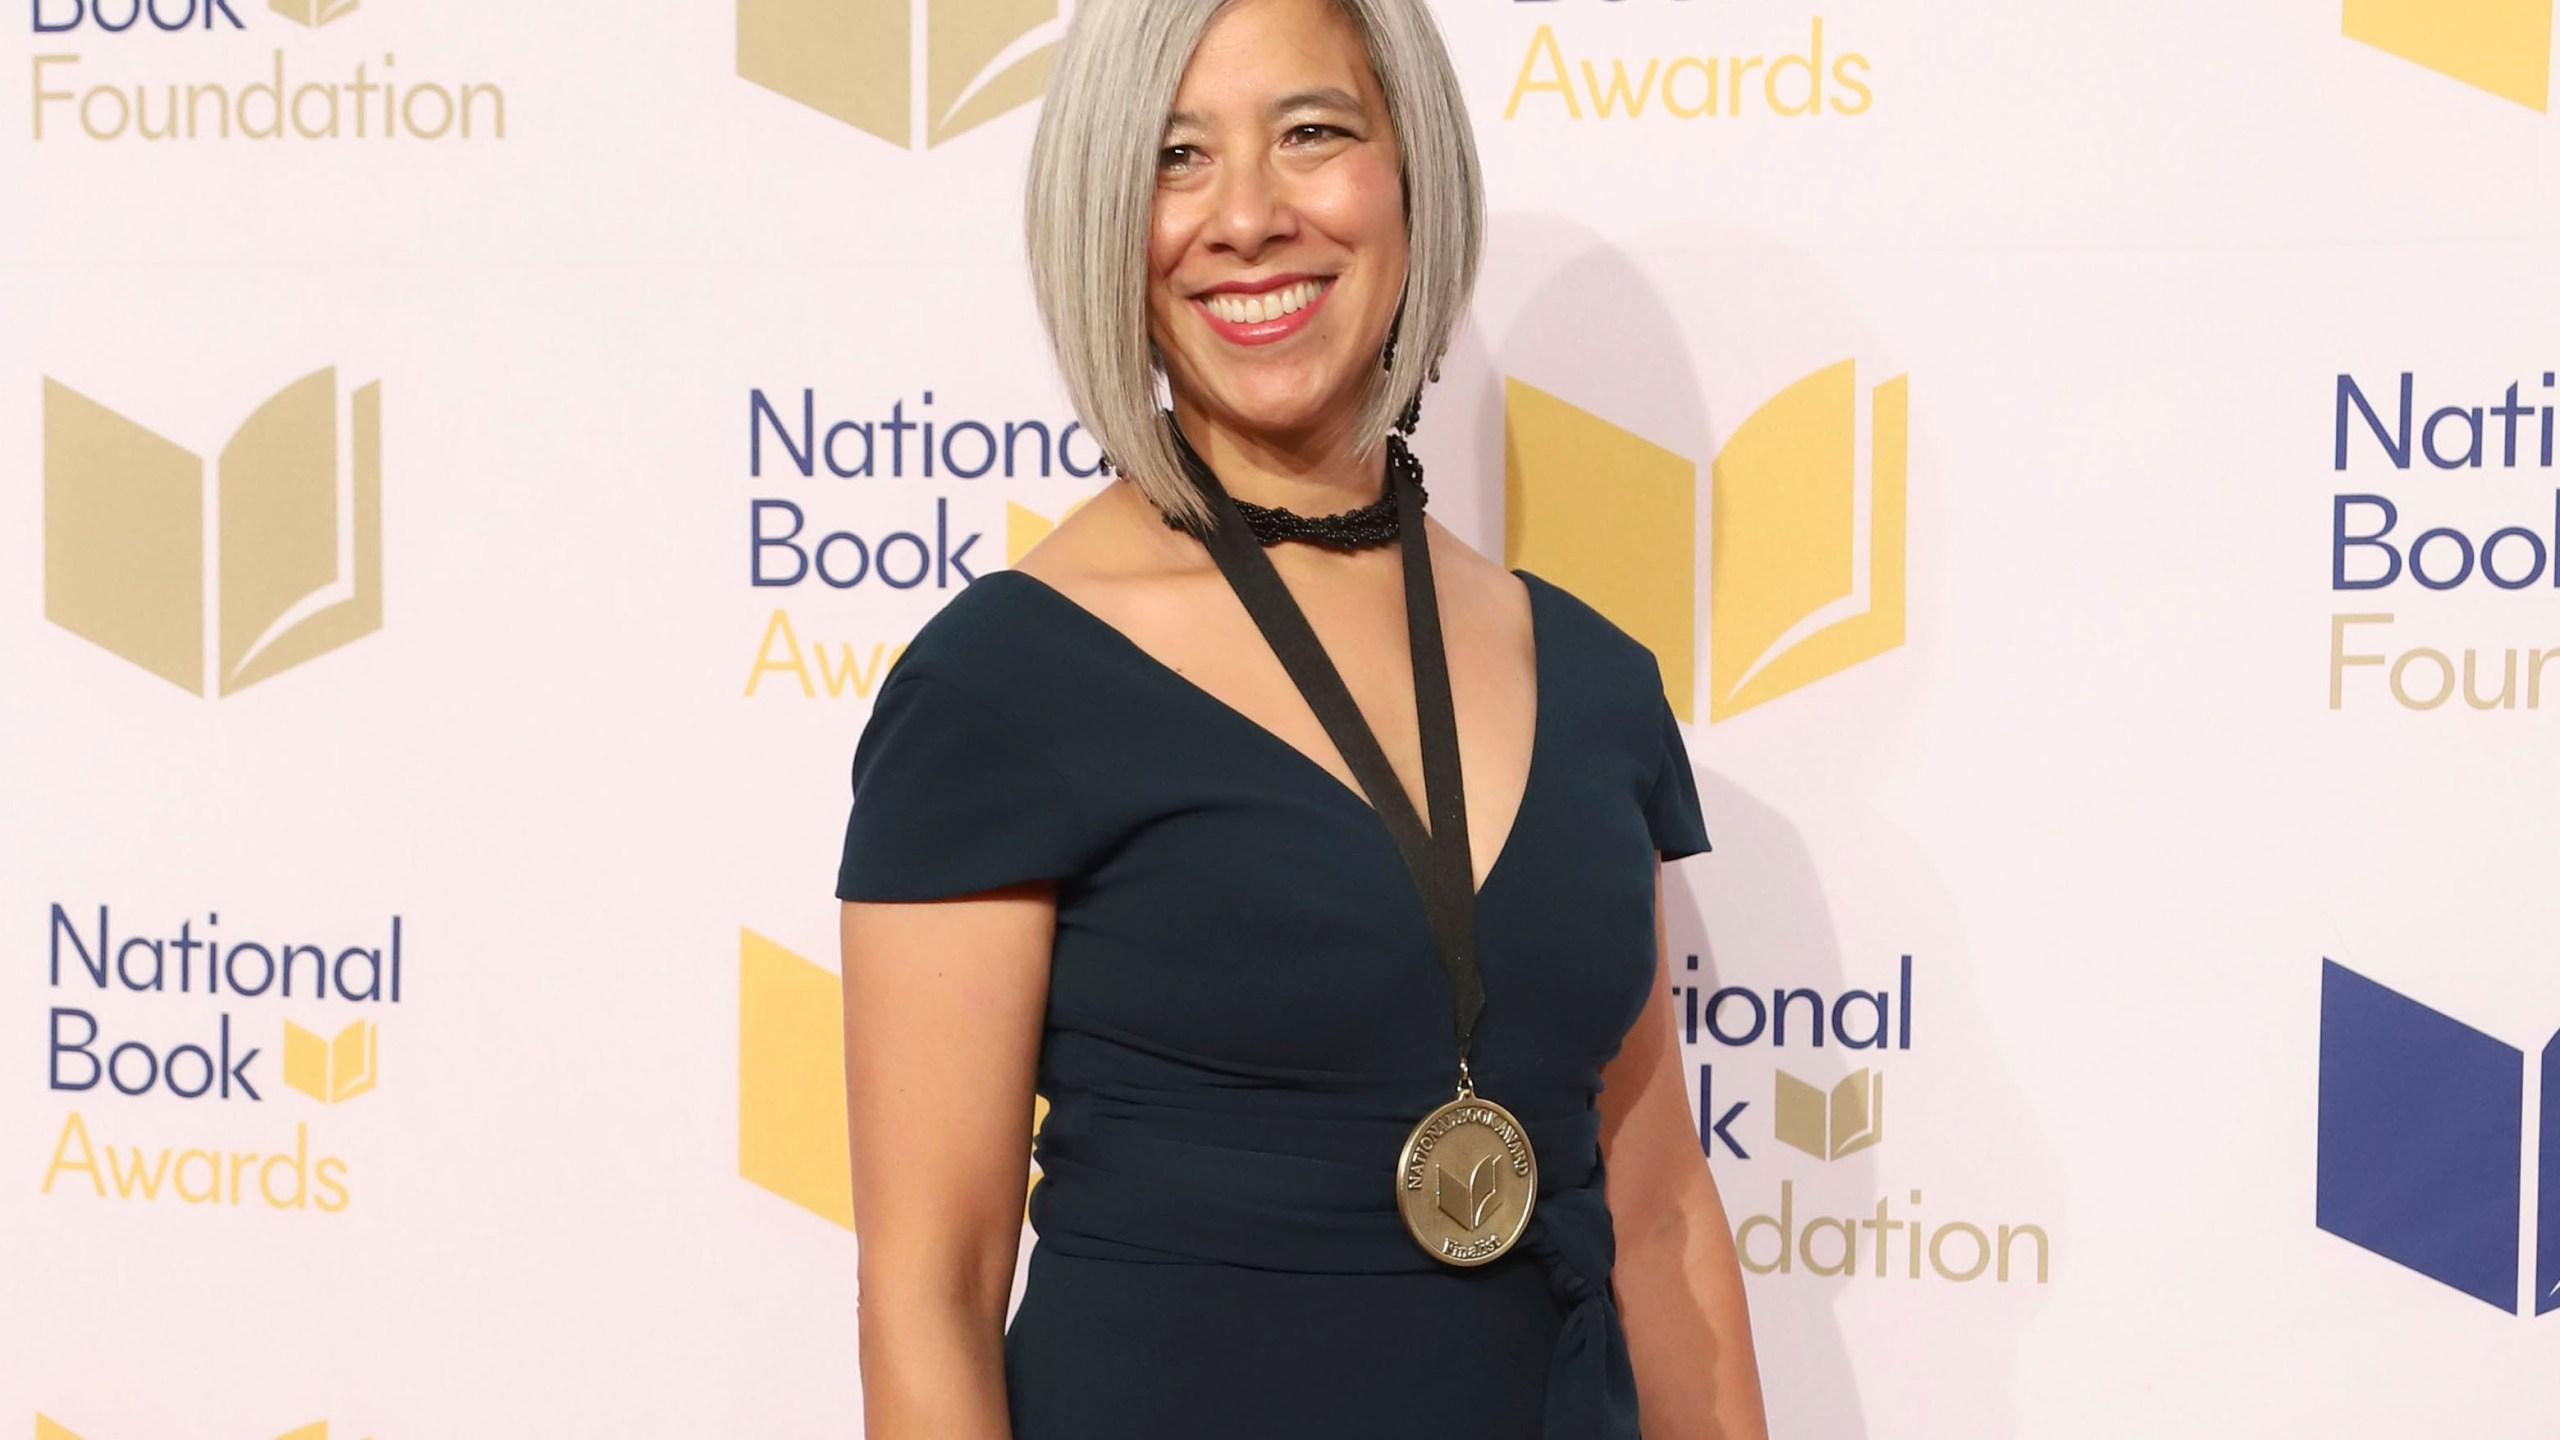 Susan Choi